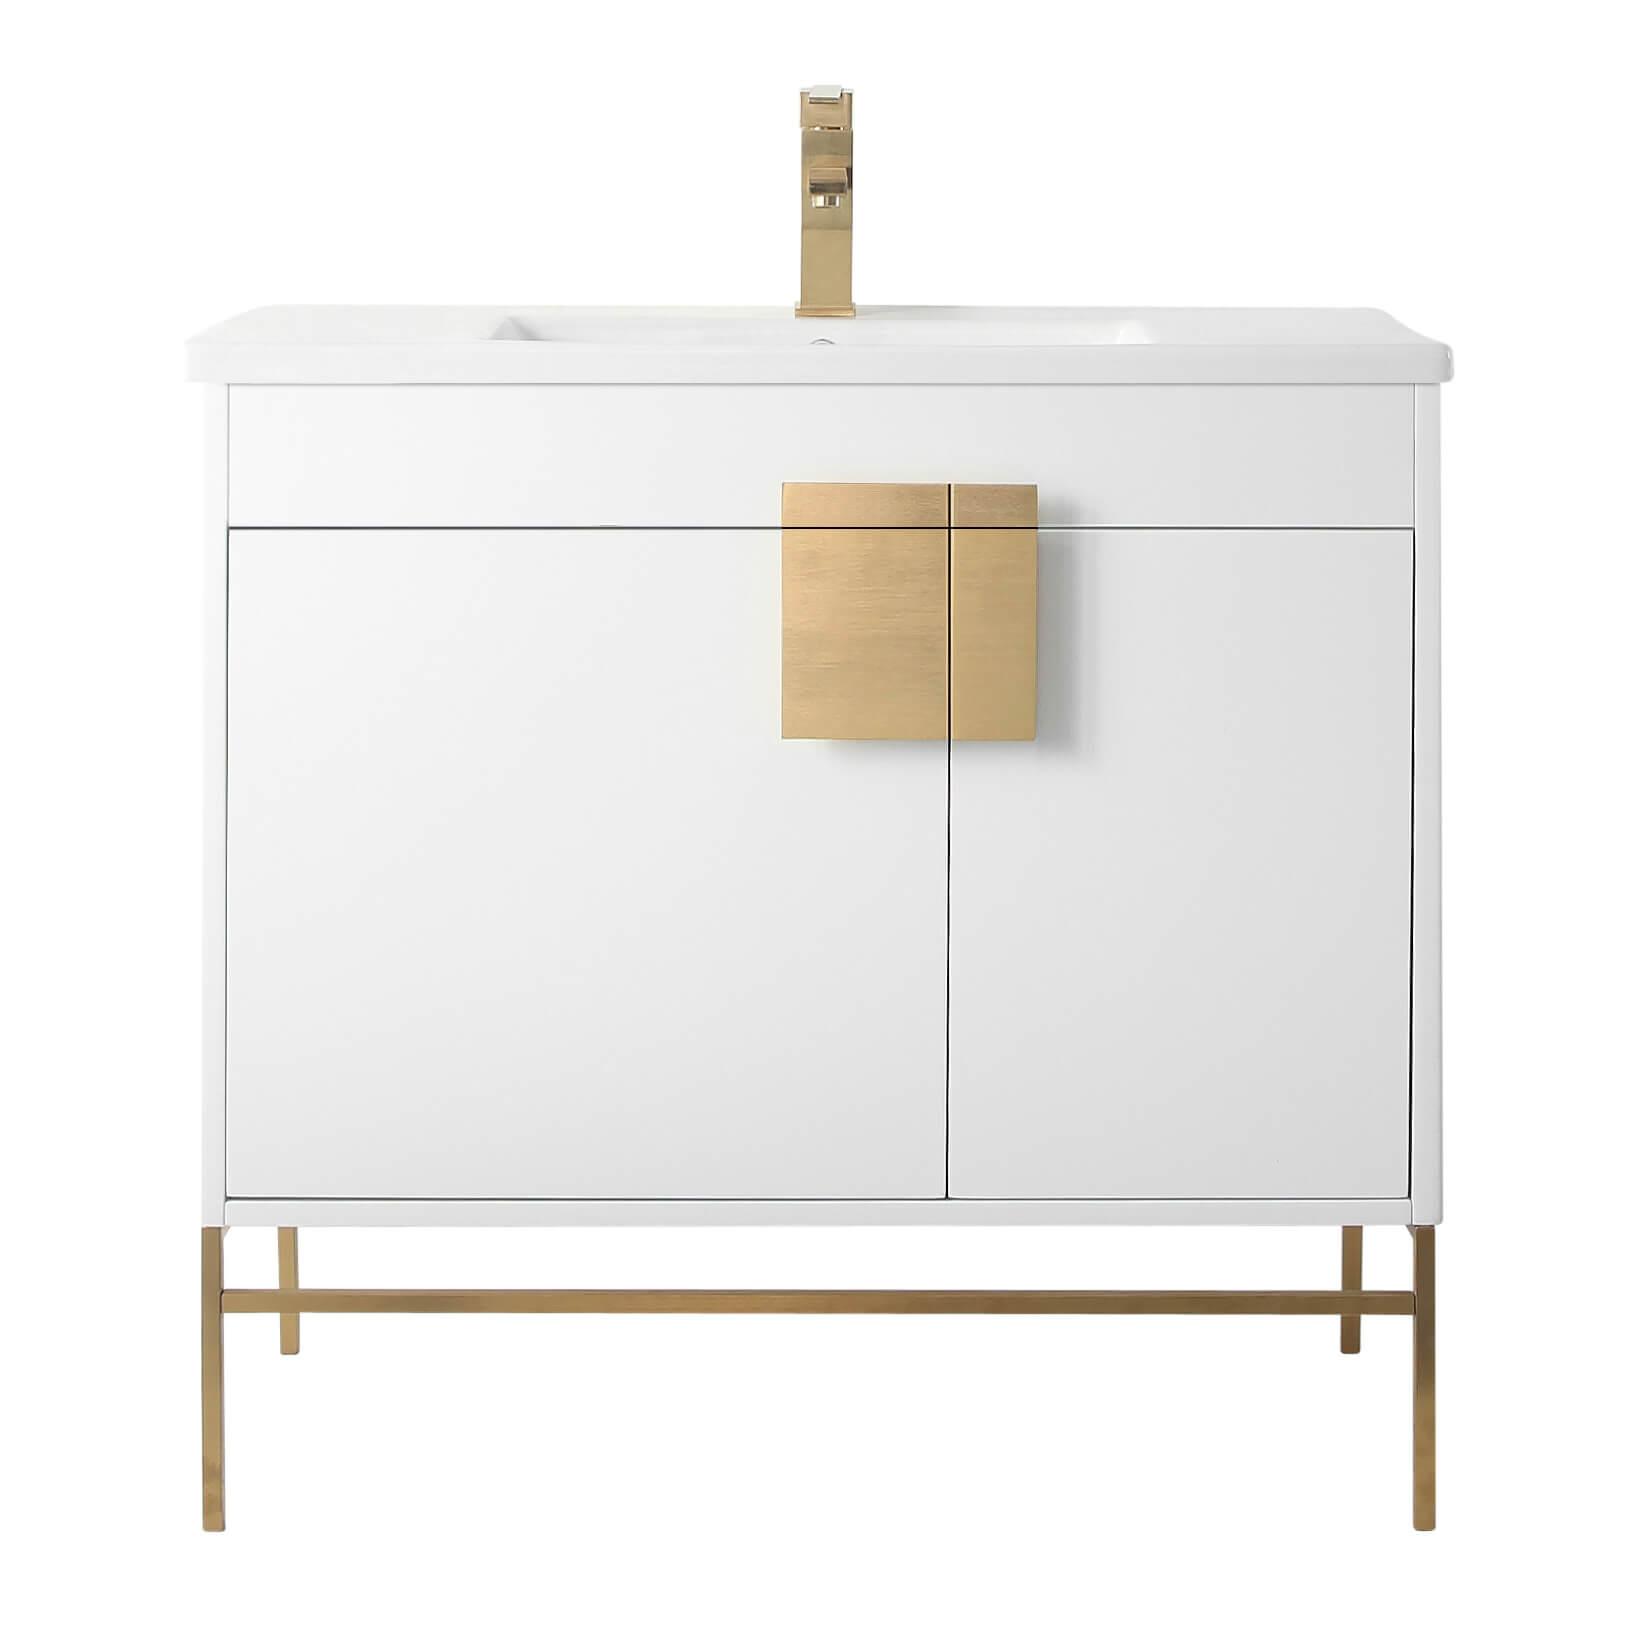 "Shawbridge 36"" Modern Bathroom Vanity  White with Satin Brass Hardware"